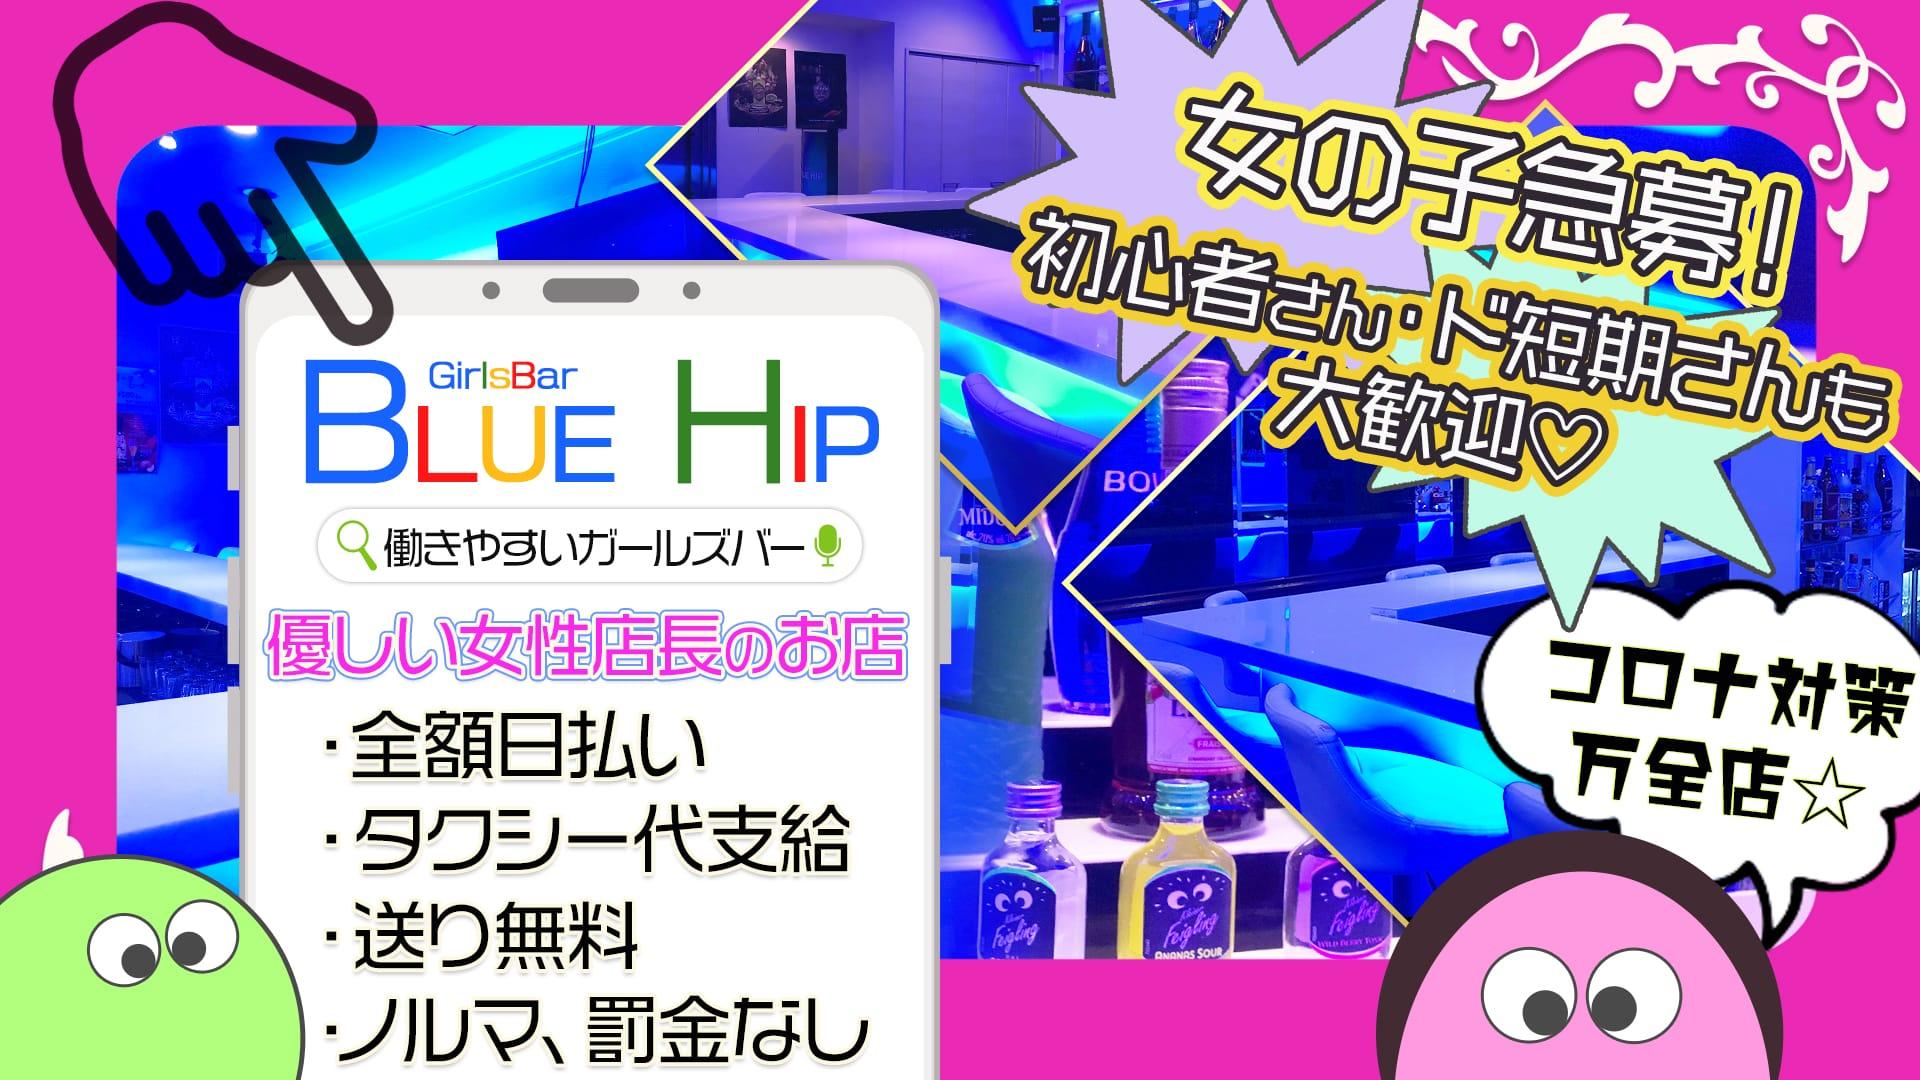 GirlsBar BlueHip(ブルーヒップ) 松戸ガールズバー TOP画像